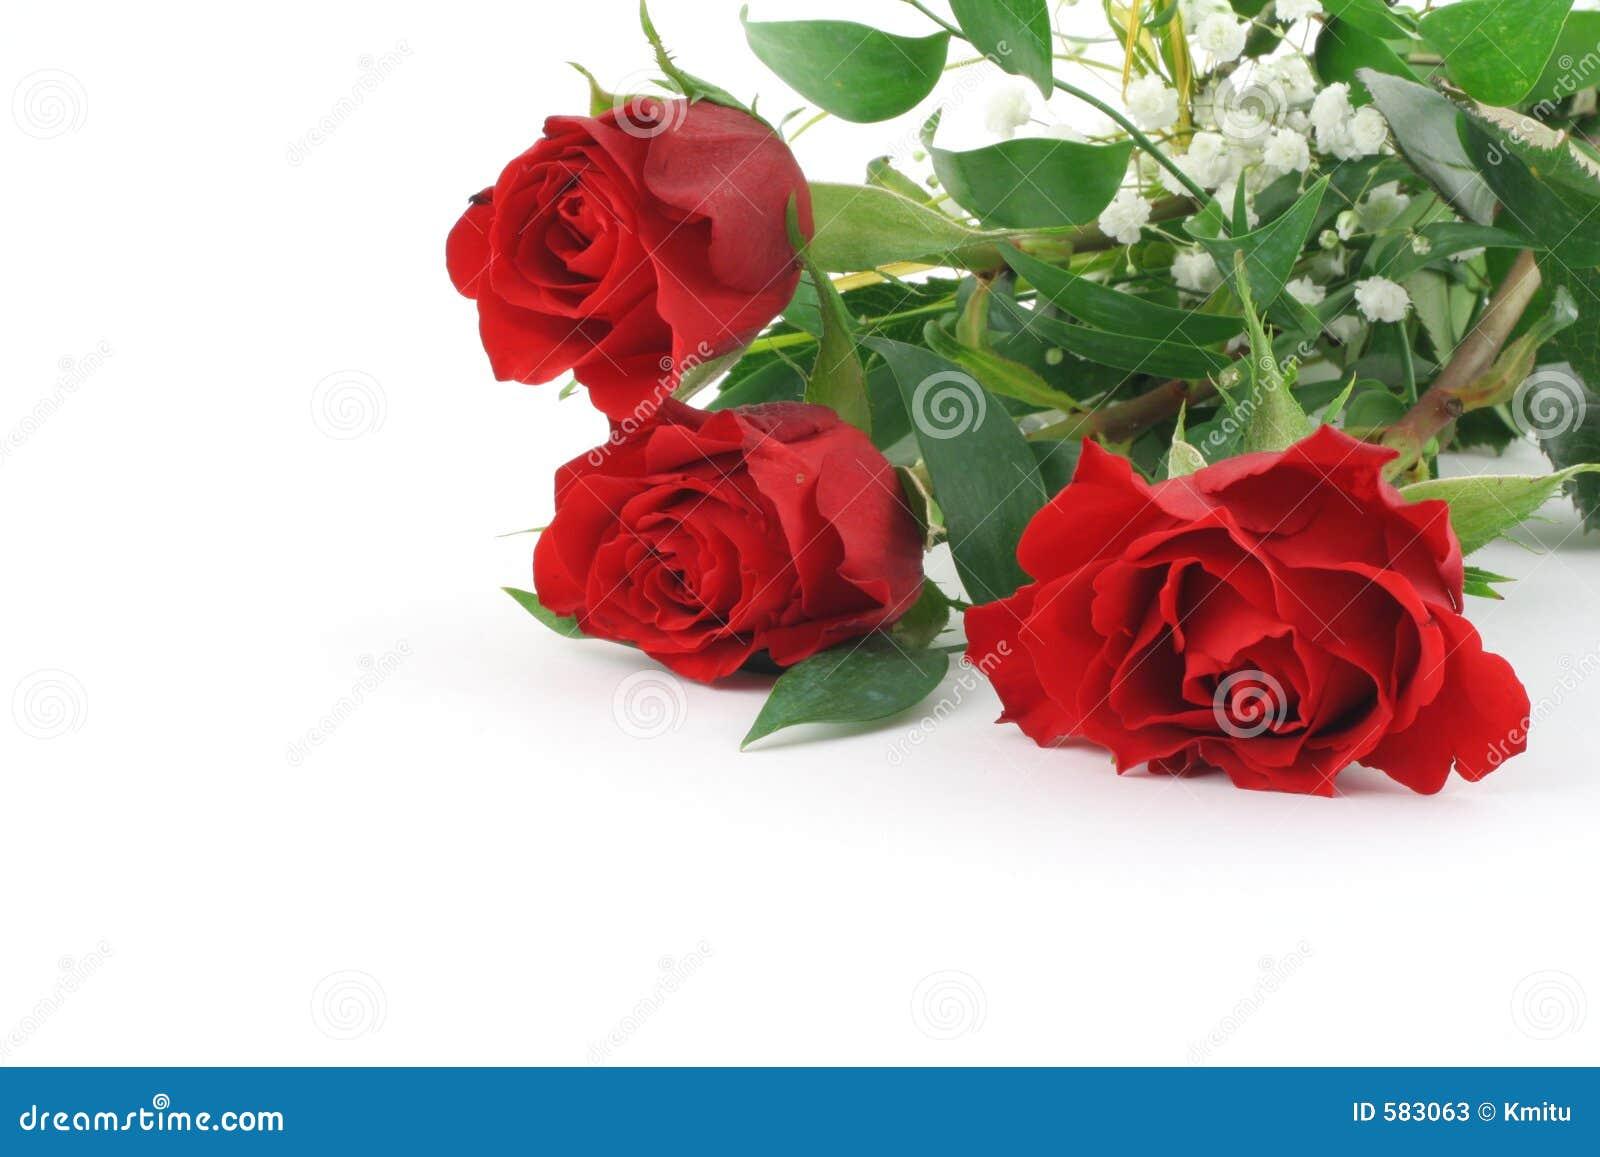 three beautiful maroon roses with decoration stock photos - image